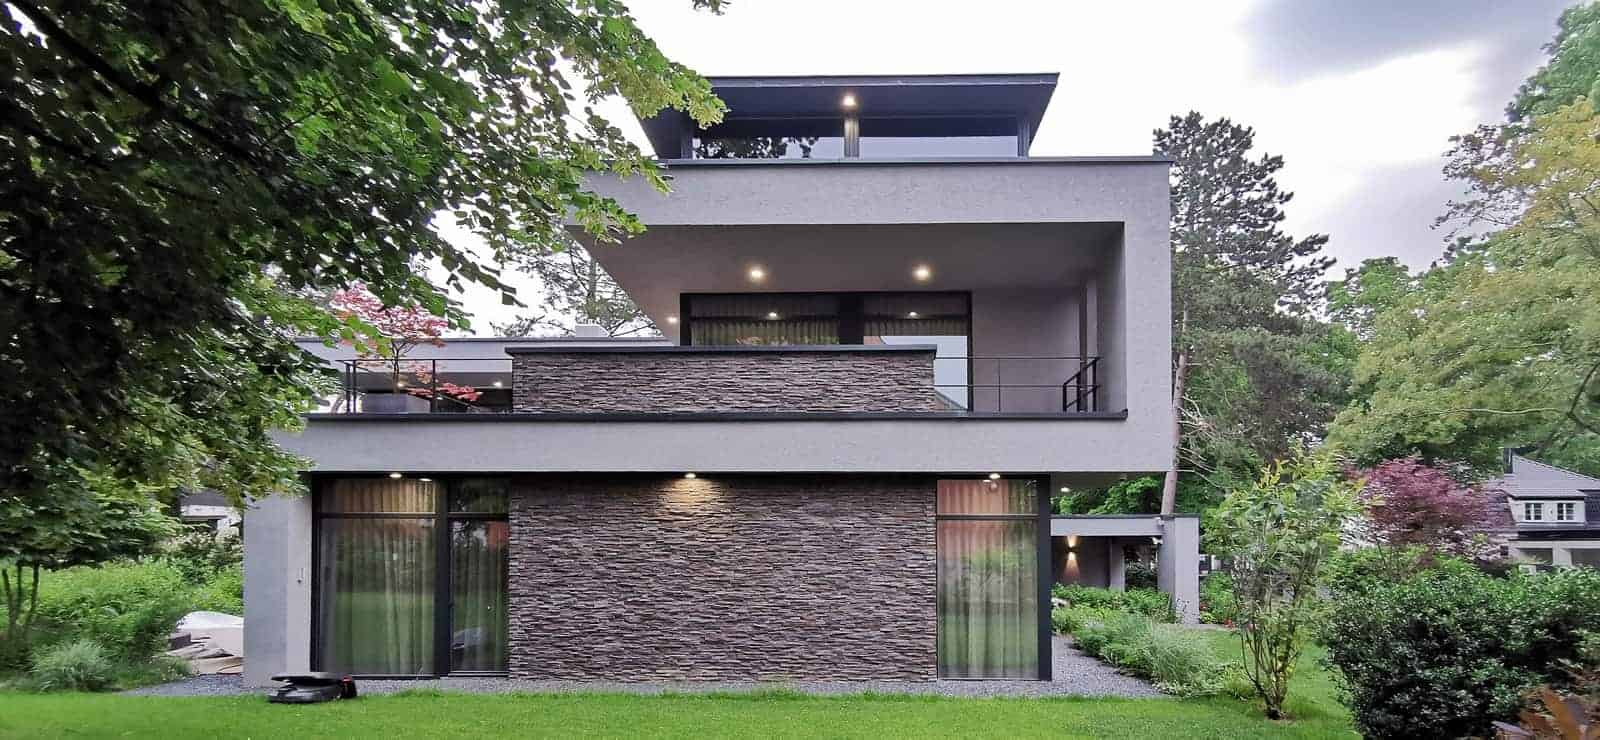 Wohnhaus Bauhausstil